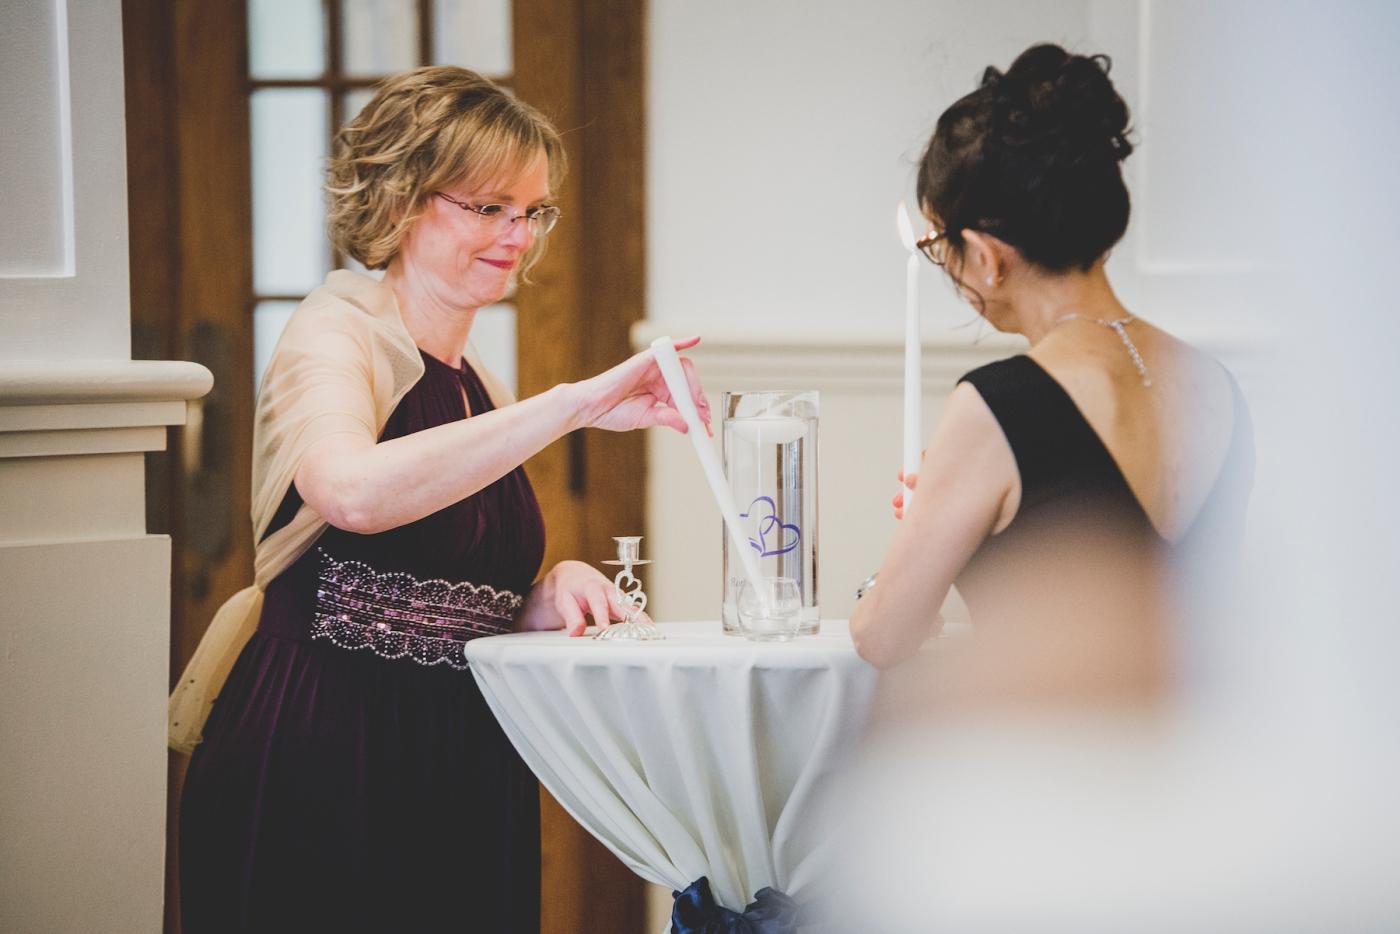 DSC_2536Everett_Wedding_Ballroom_Jane_Speleers_photography_Rachel_and_Edmund_Ceremony_2017